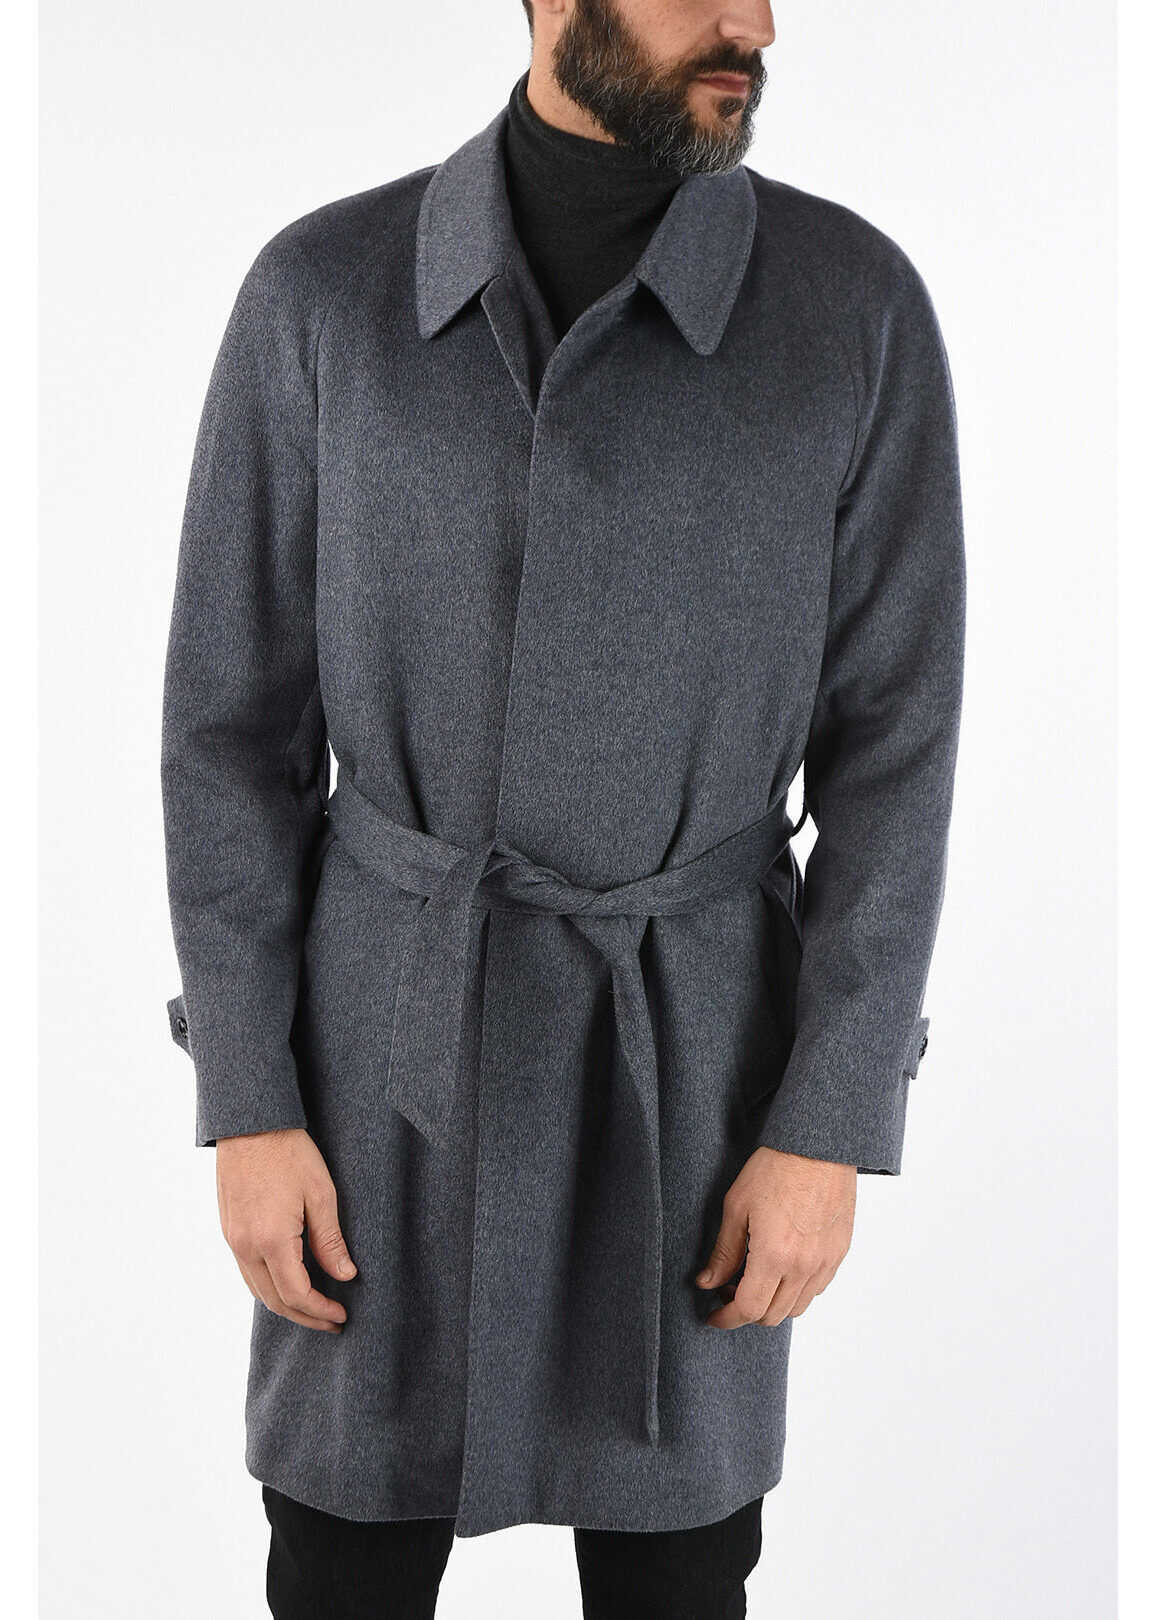 CORNELIANI Cashmere coat GRAY imagine